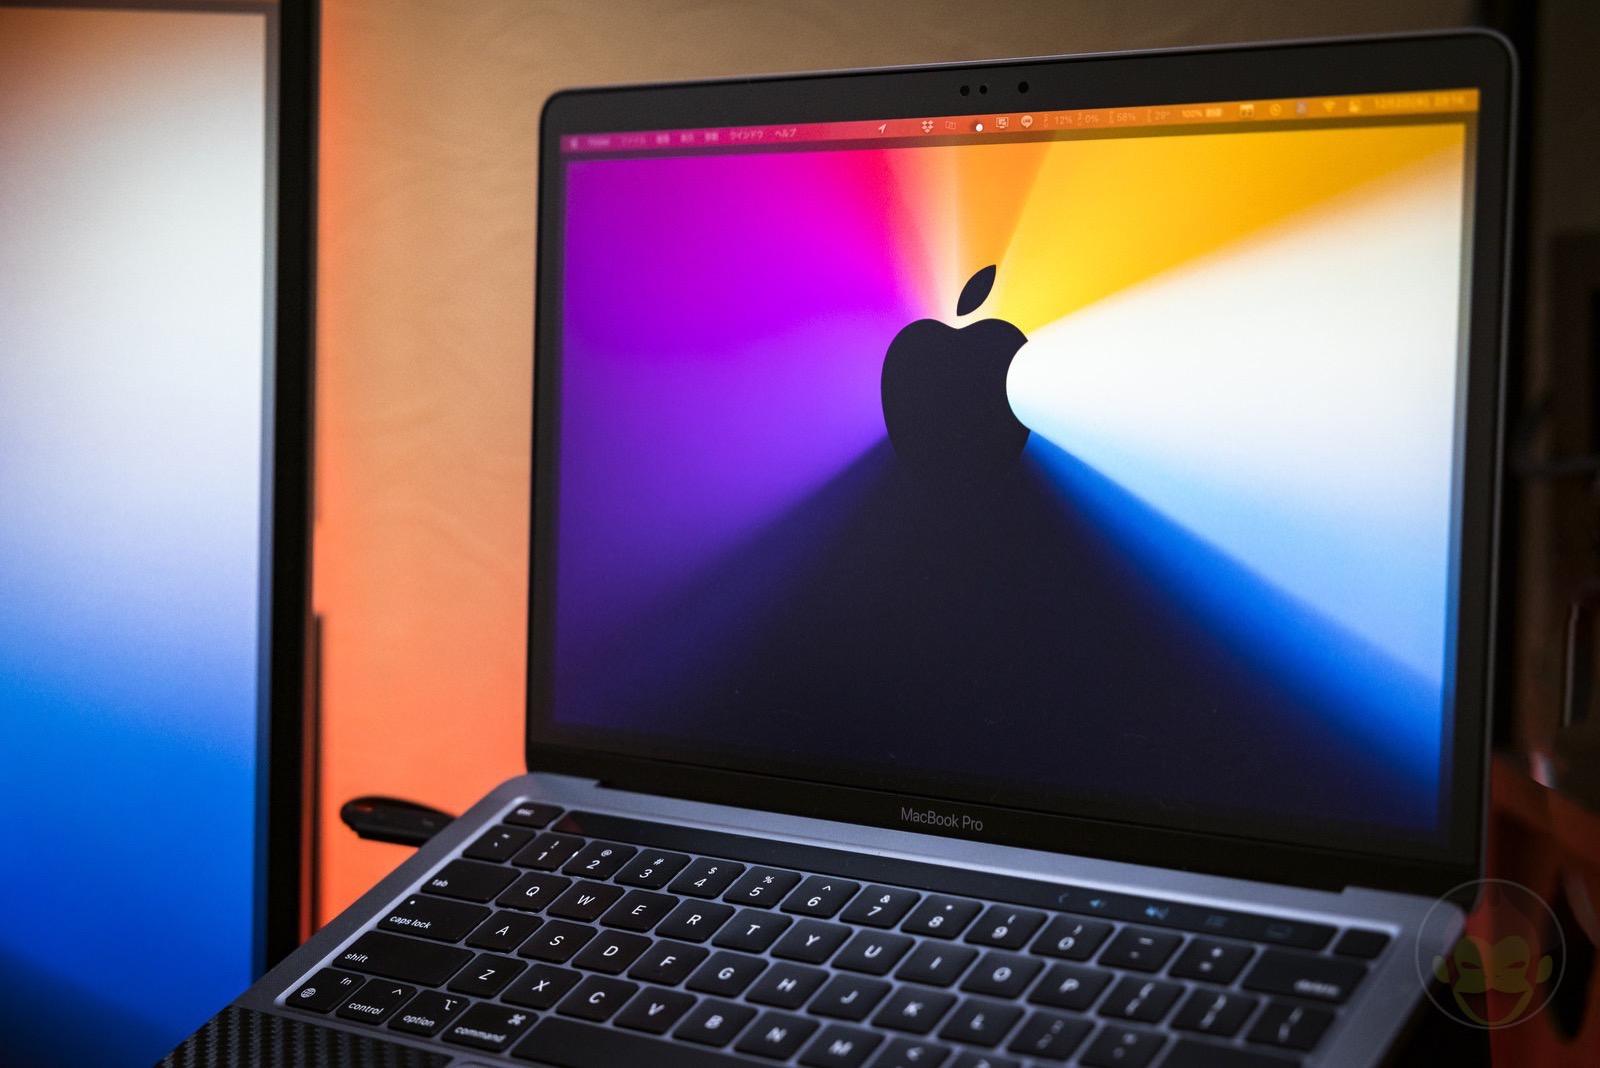 MacBook Pro with display 01